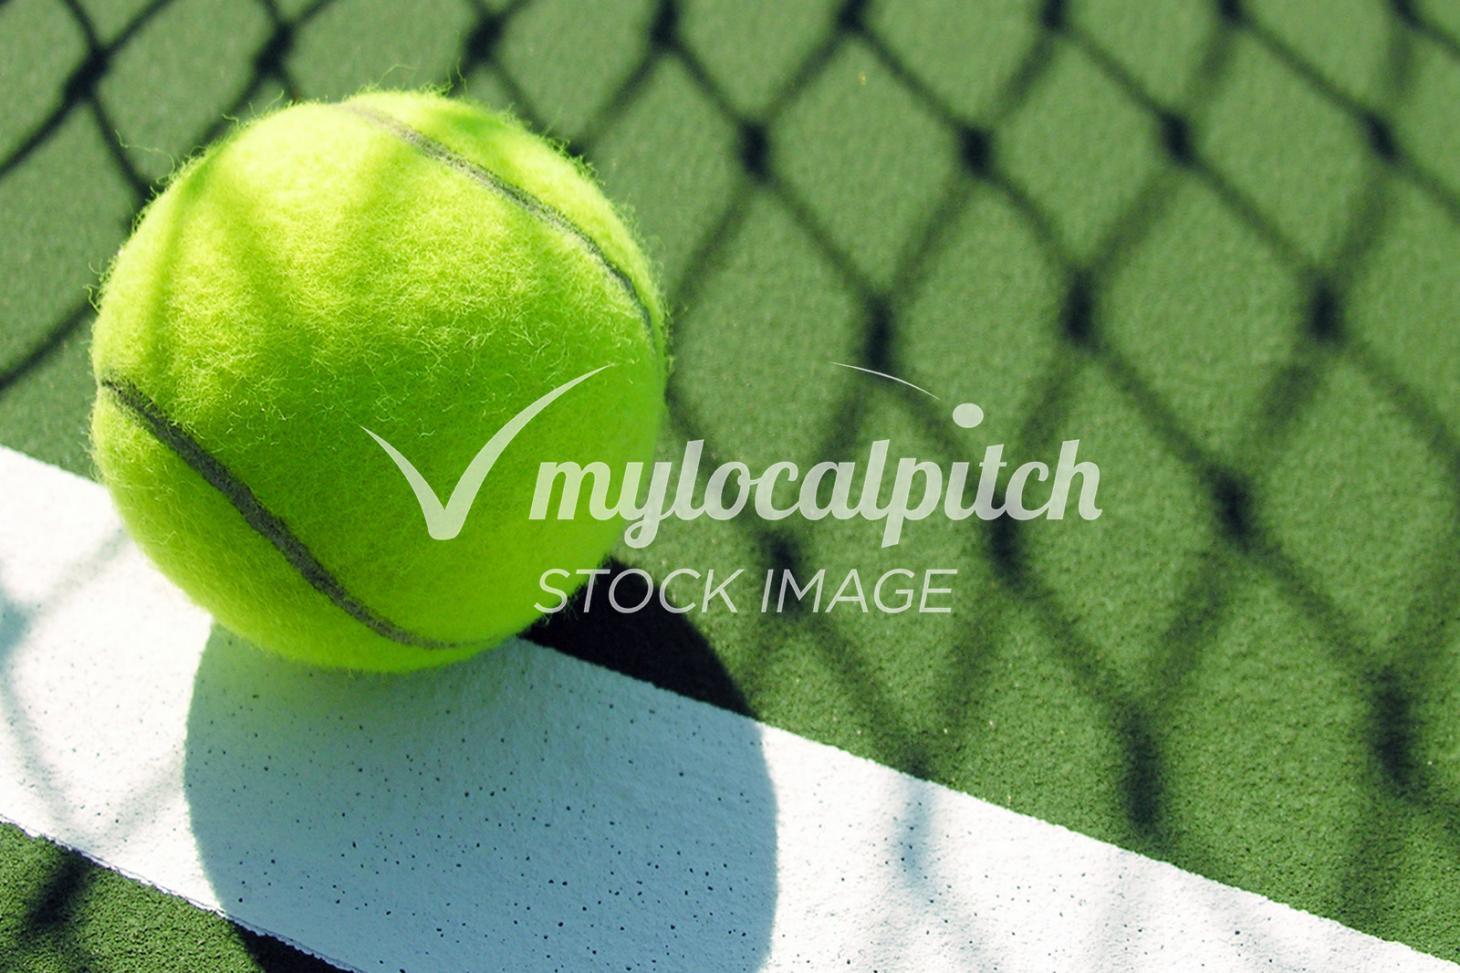 Challney High School for Boys Outdoor | Astroturf tennis court